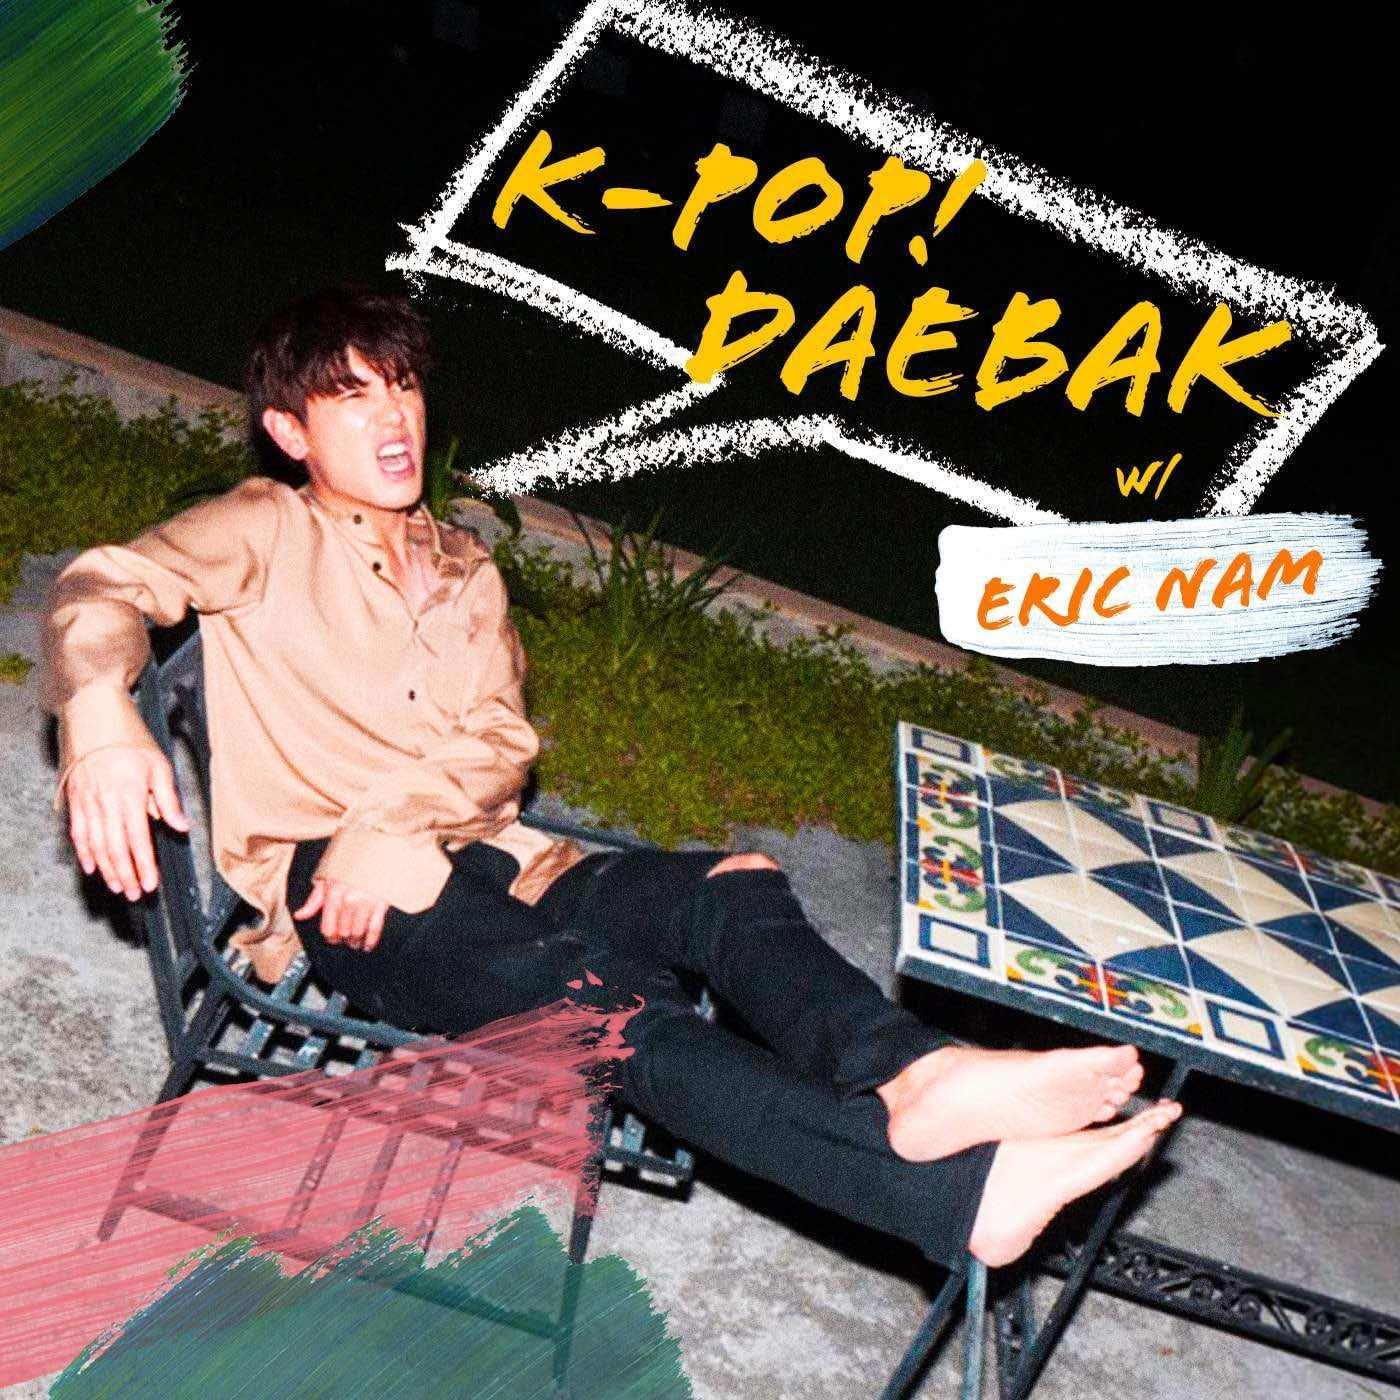 K-Pop Daebak w/ Eric Nam (podcast) - DIVE Studios | Listen Notes